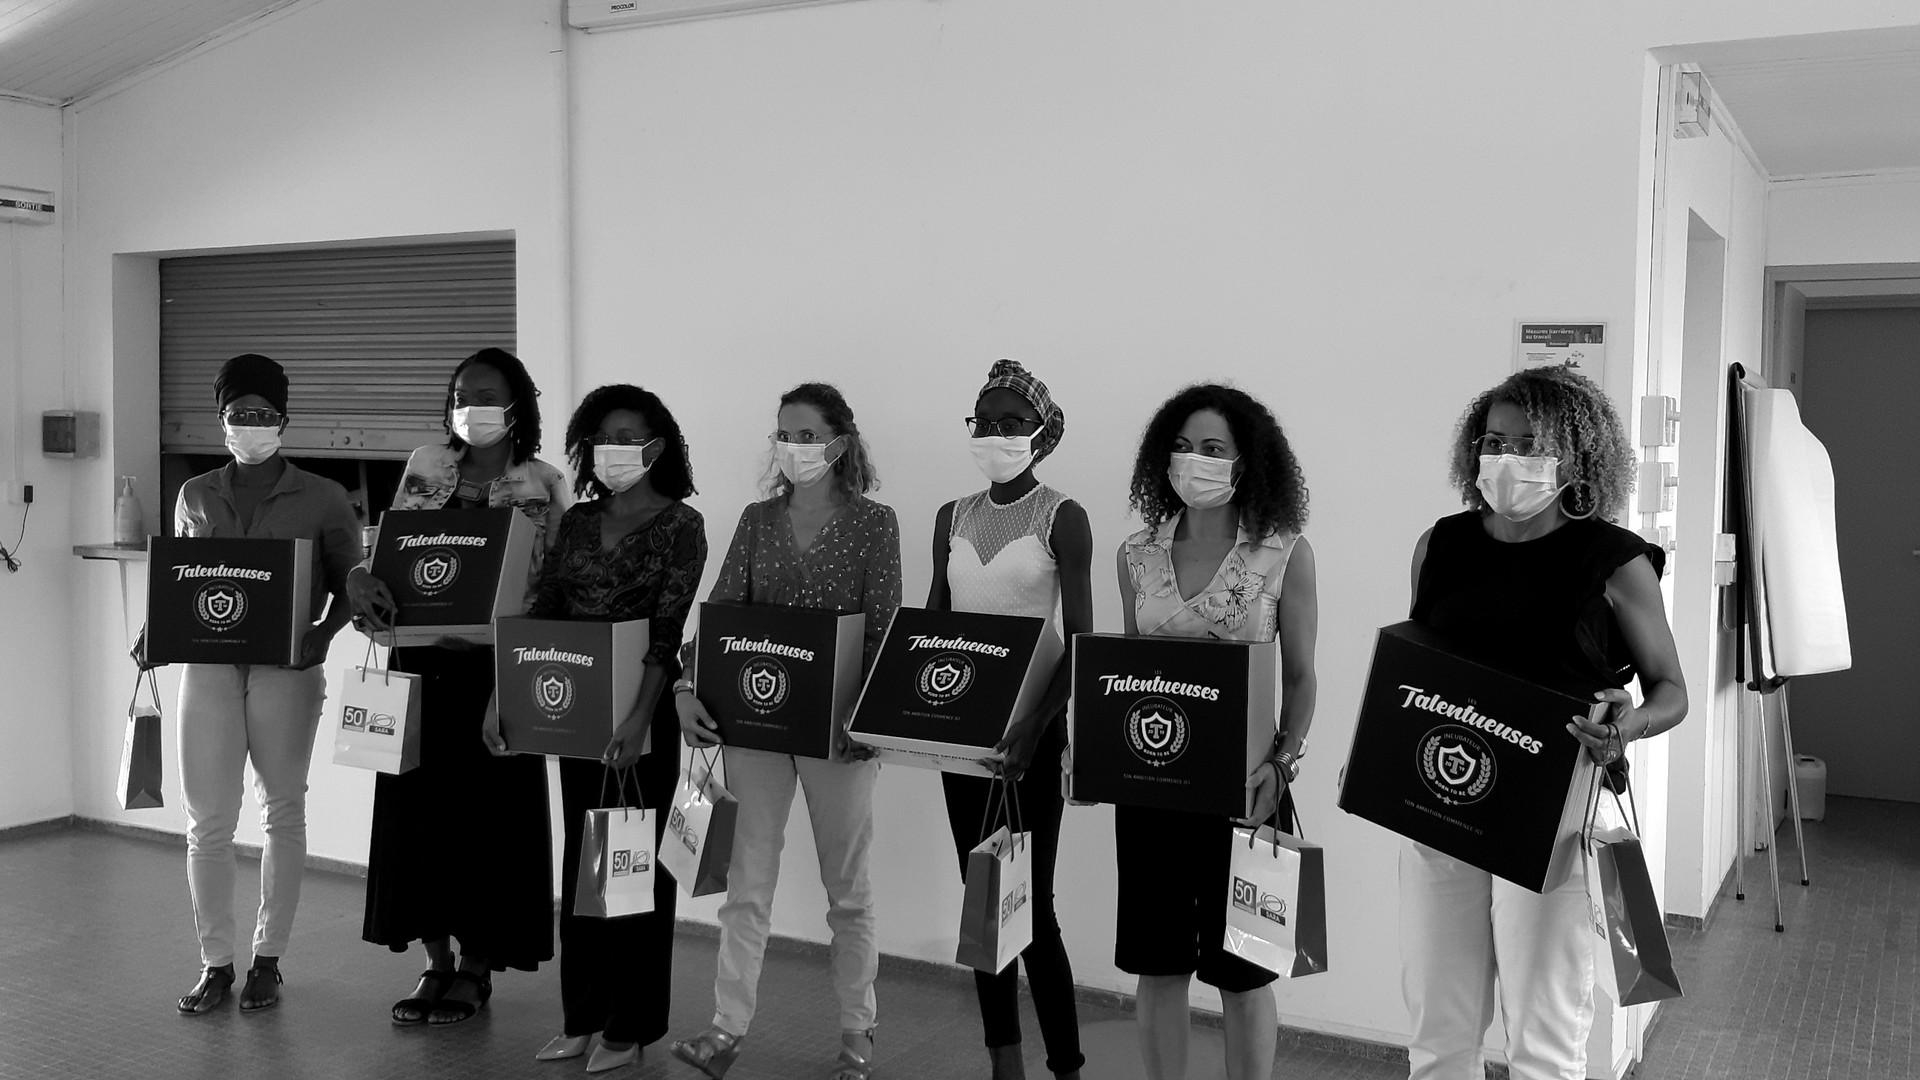 Cohorte Les Talenteuses Martinique 2 - La Sara